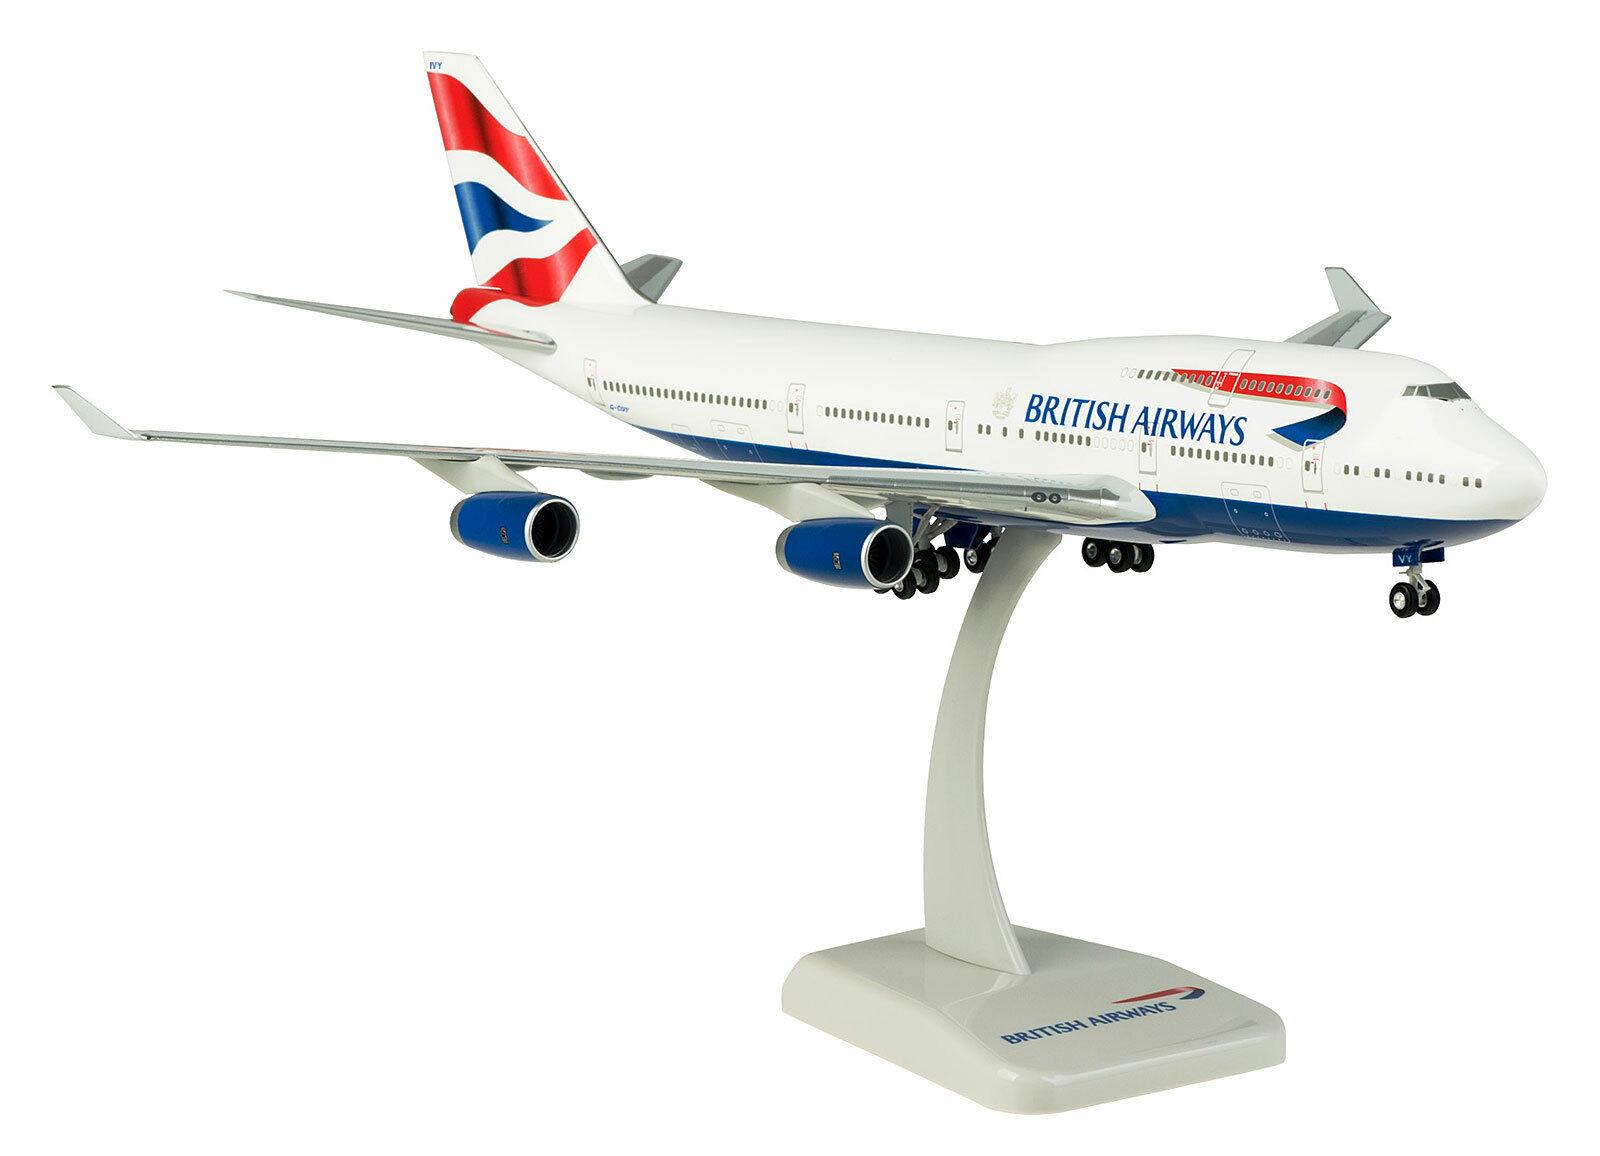 British Airways Boeing 747-400 1 200 LuPa Modell 10192 B747 NEU BA G-CIVY